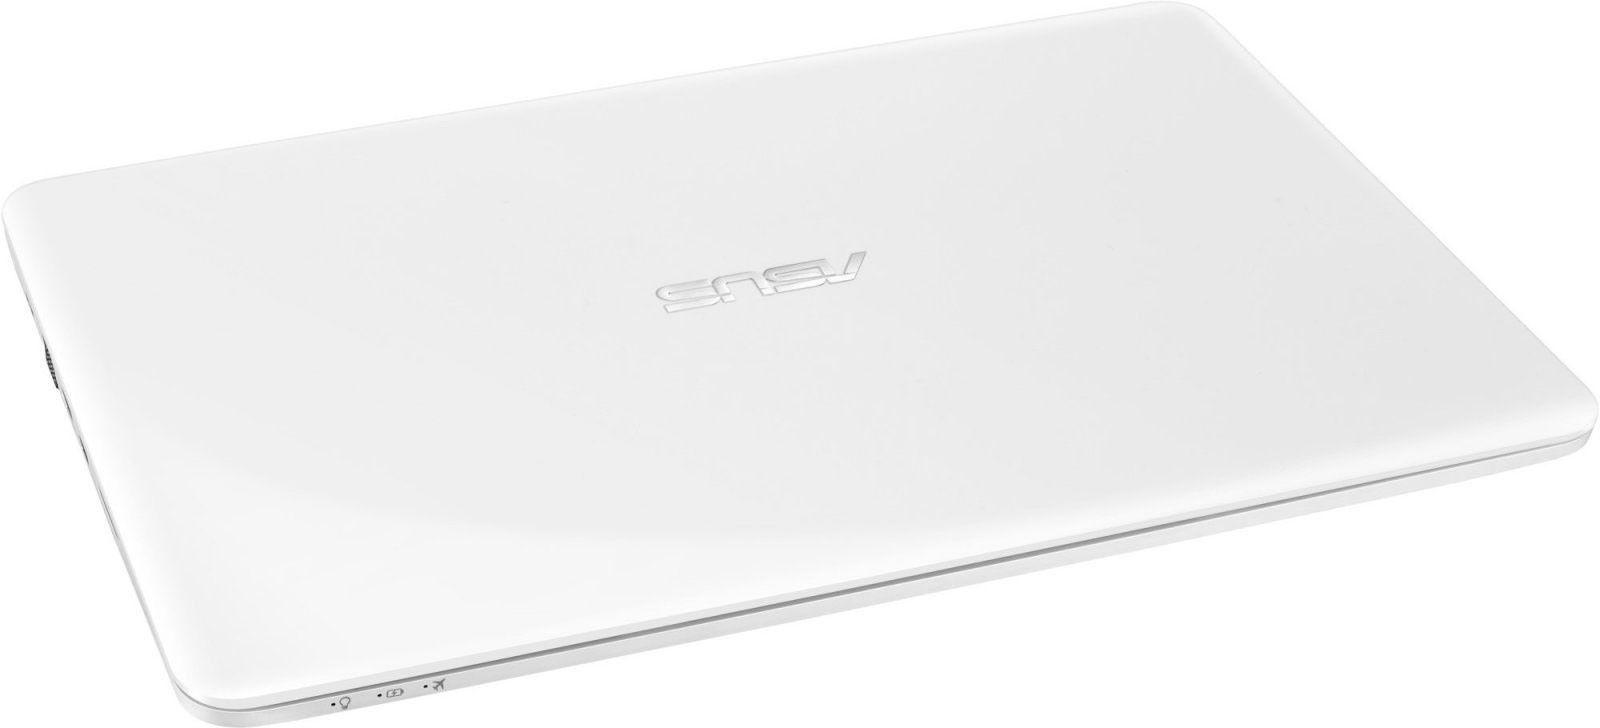 Ноутбук Asus EeeBook E402SA (E402SA-WX001D) White - 3